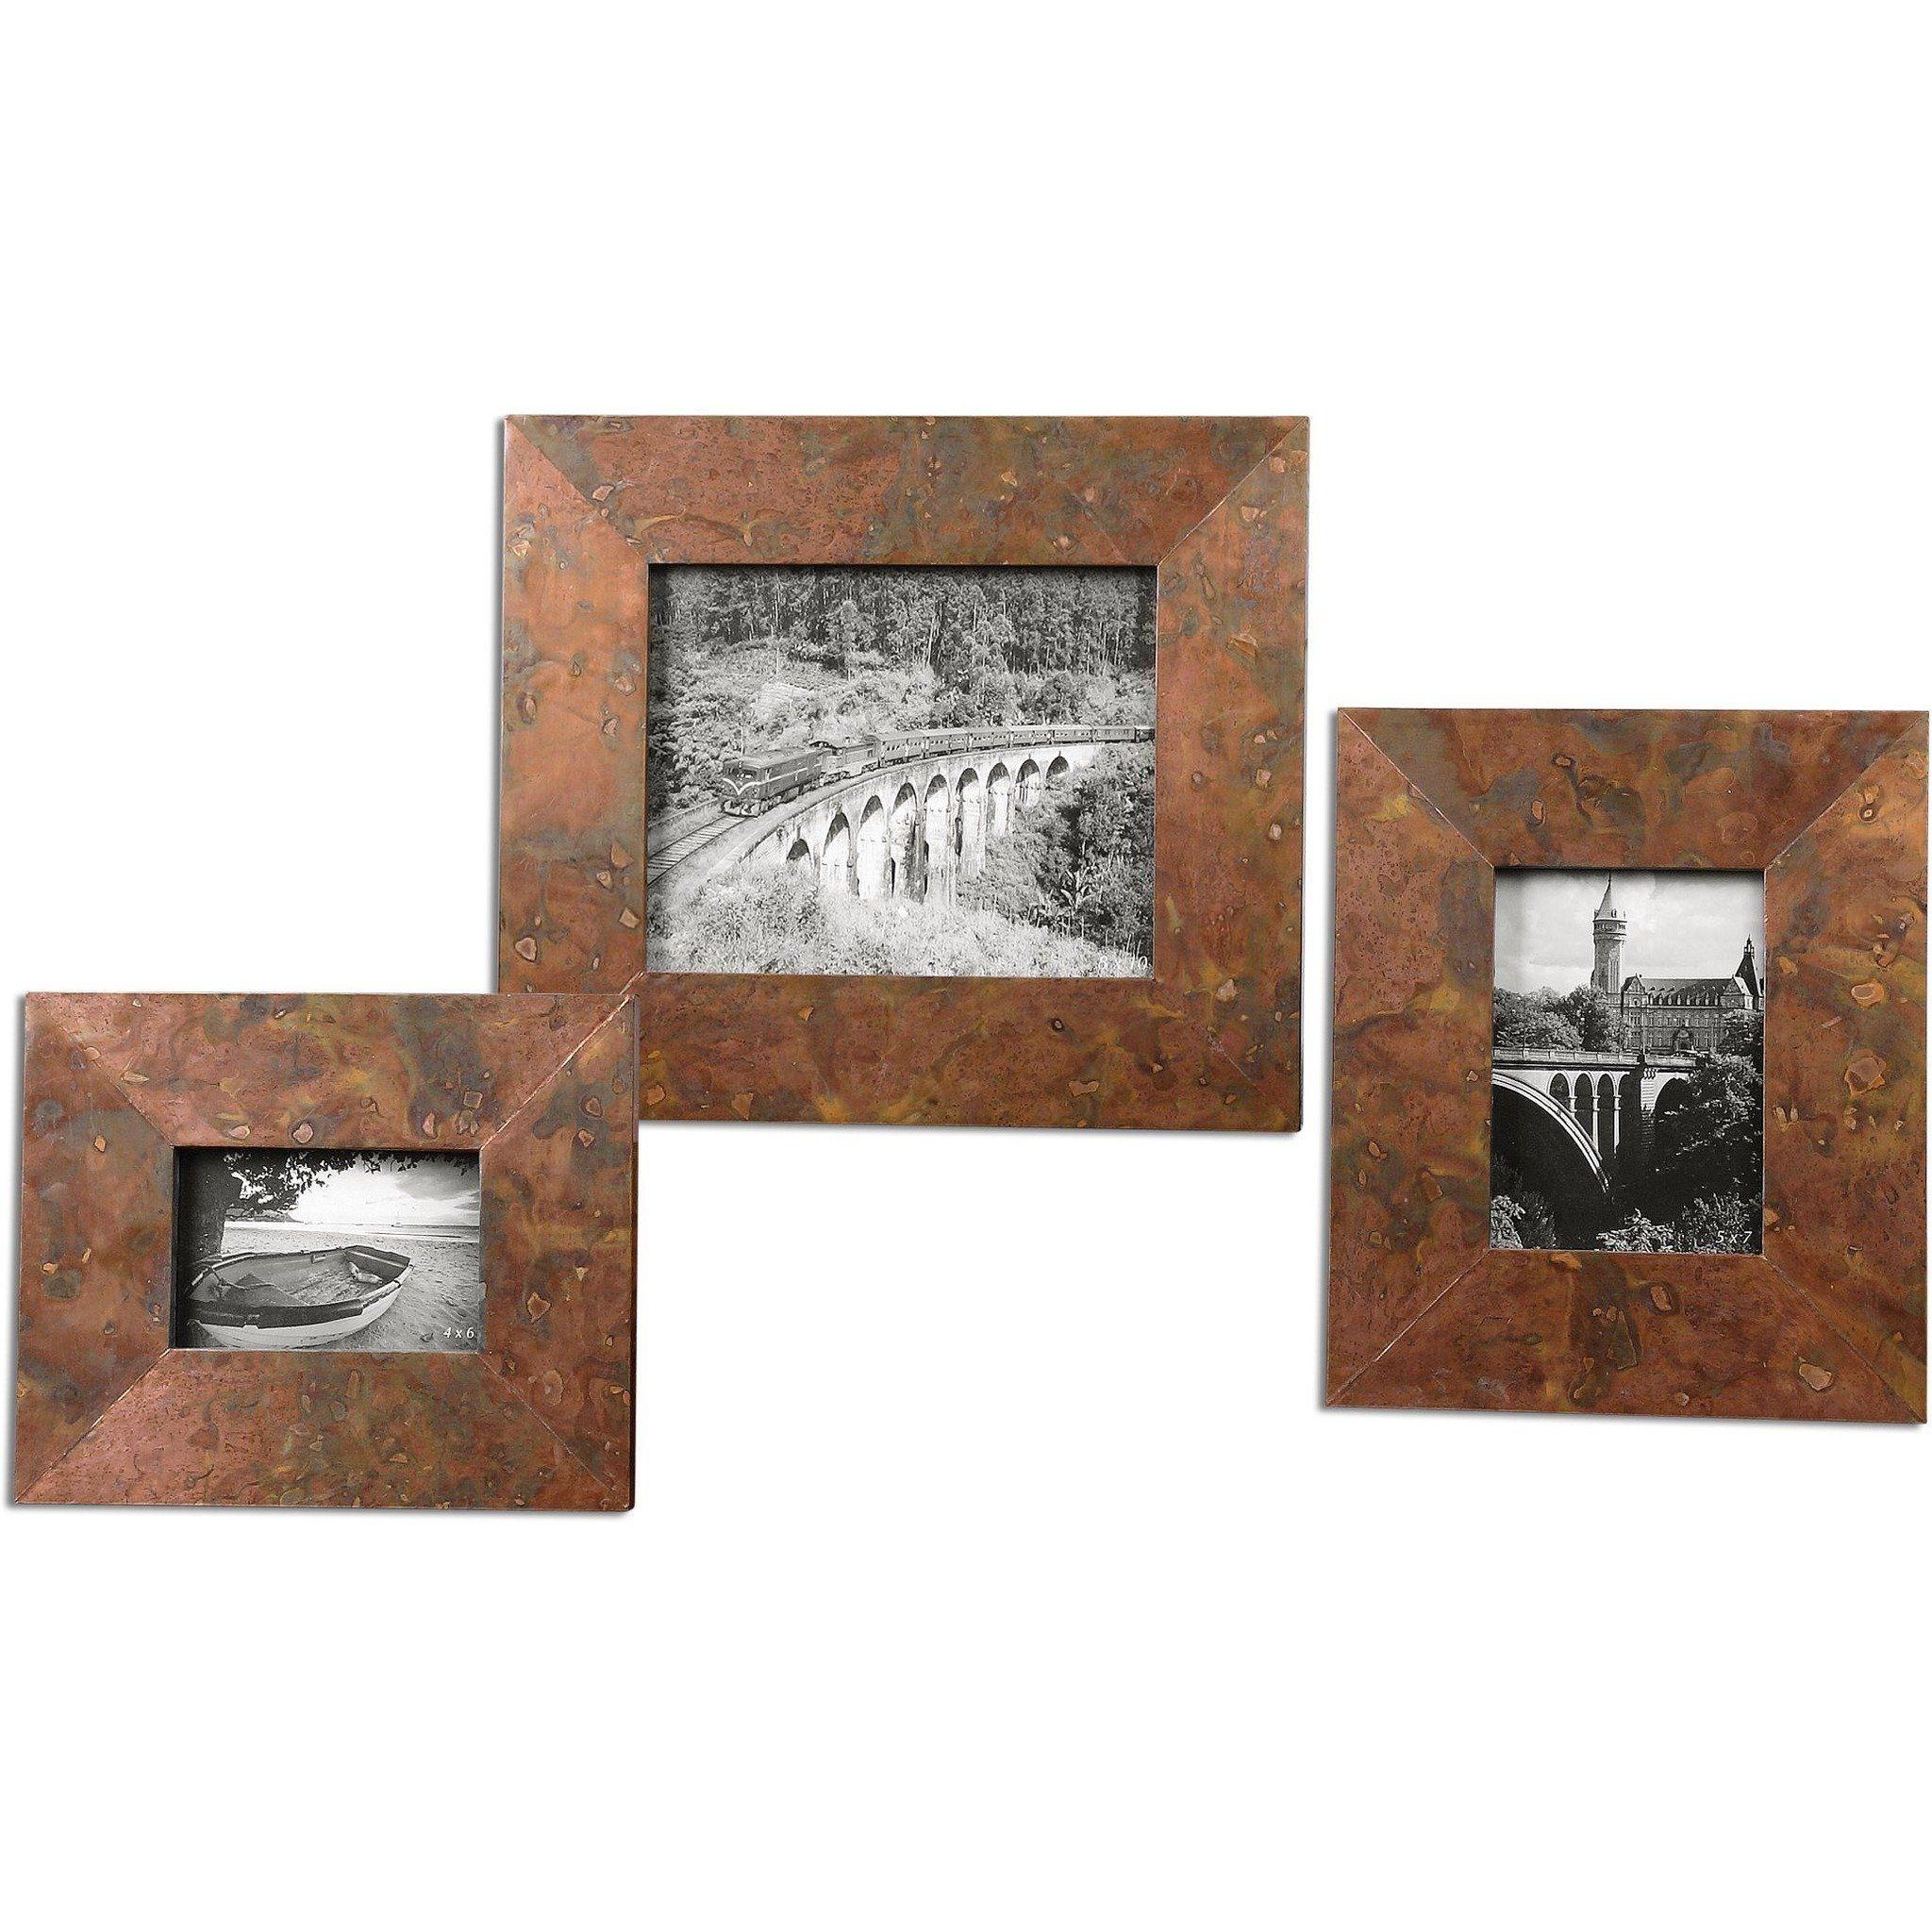 Ambrosia Copper Photo Frames S 3 Copper Photo Frame Picture Frame Sets Copper Frame